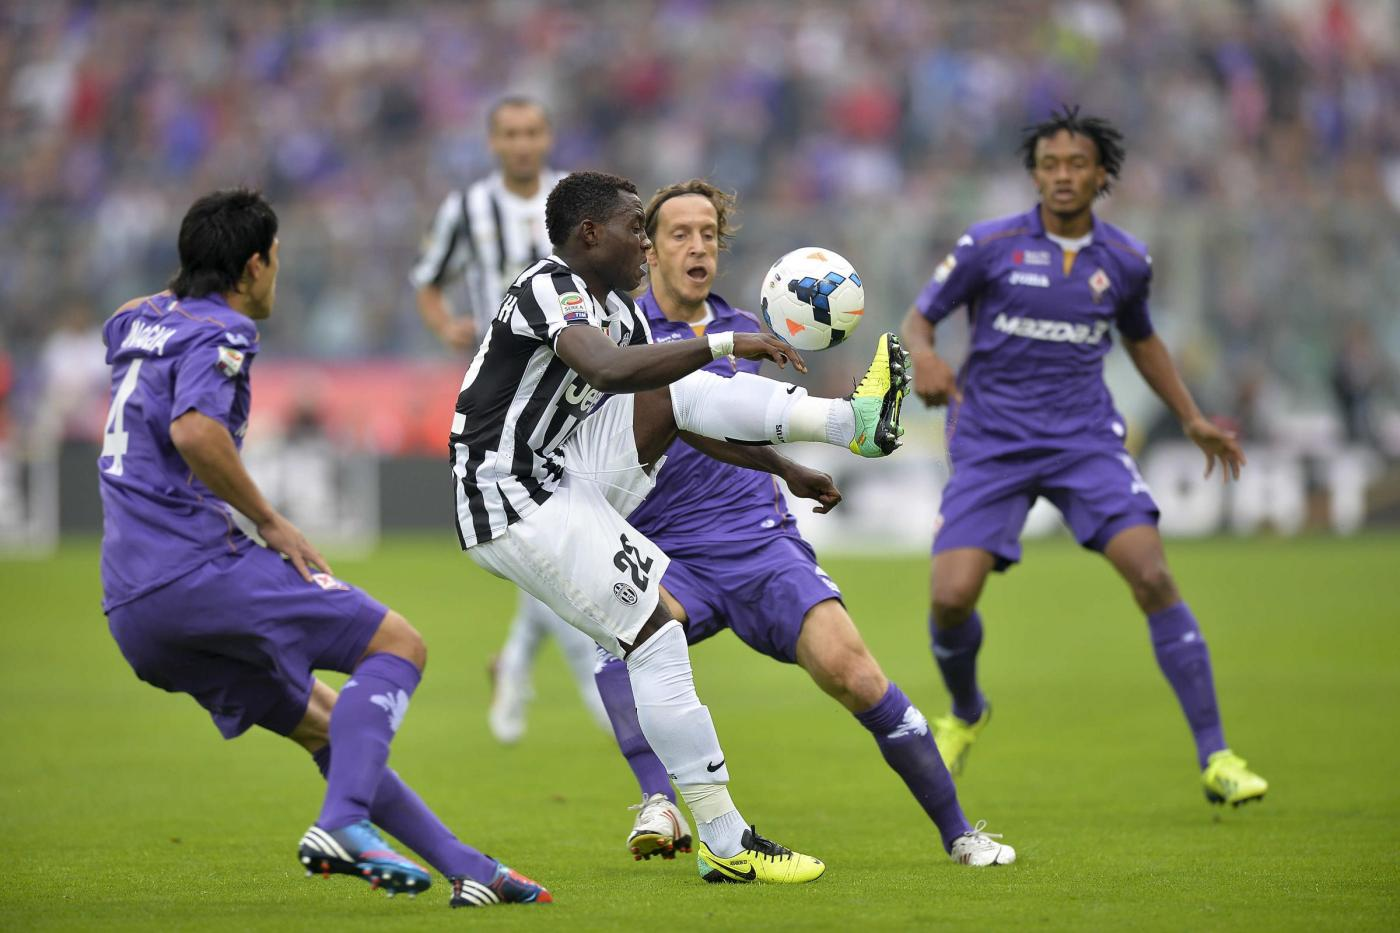 Pronóstico Fiorentina Juventus